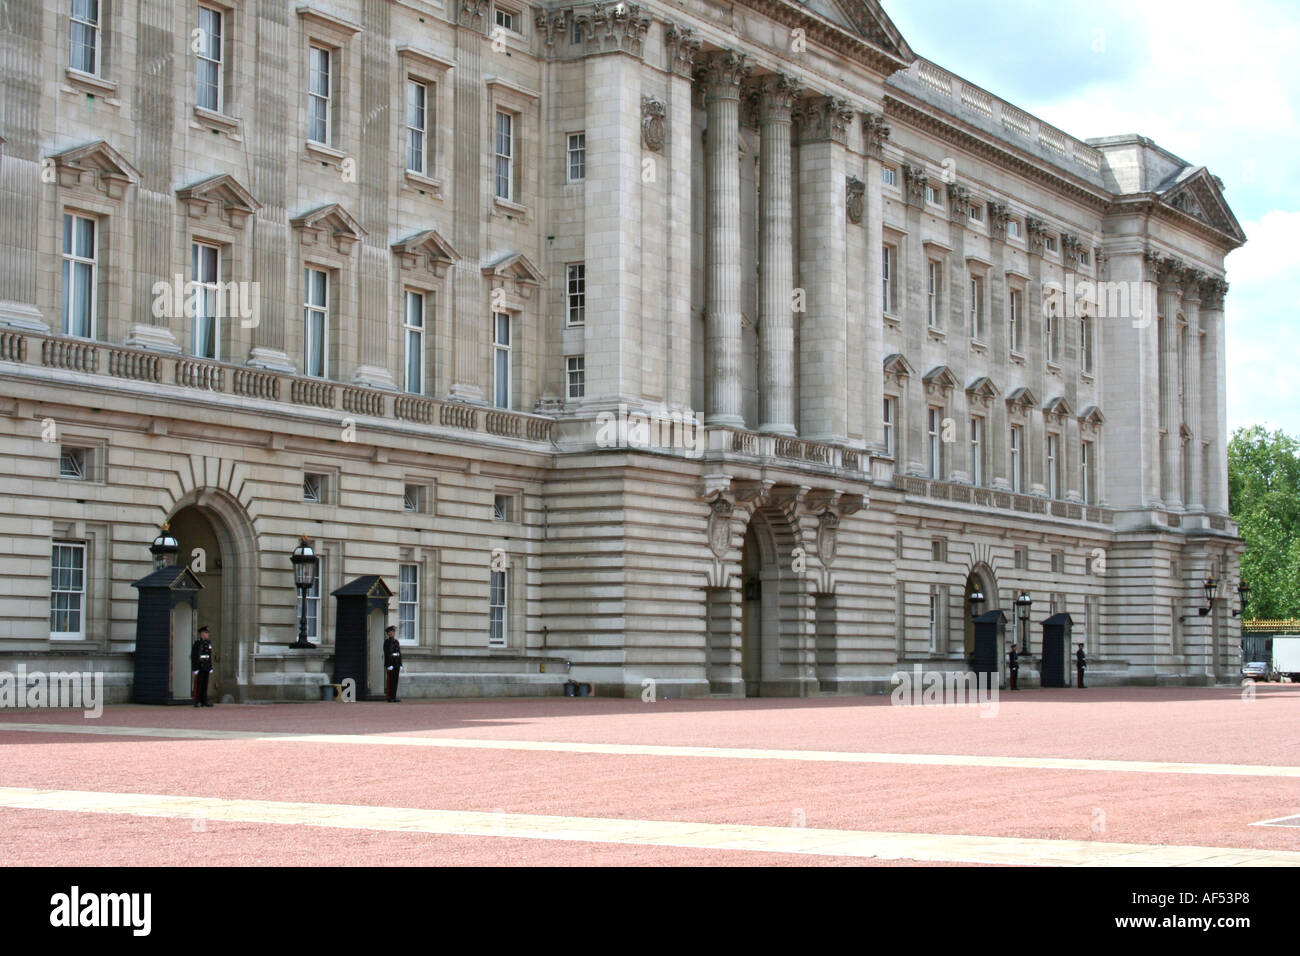 Royal Garden Party Buckingham Palace Stock Photos